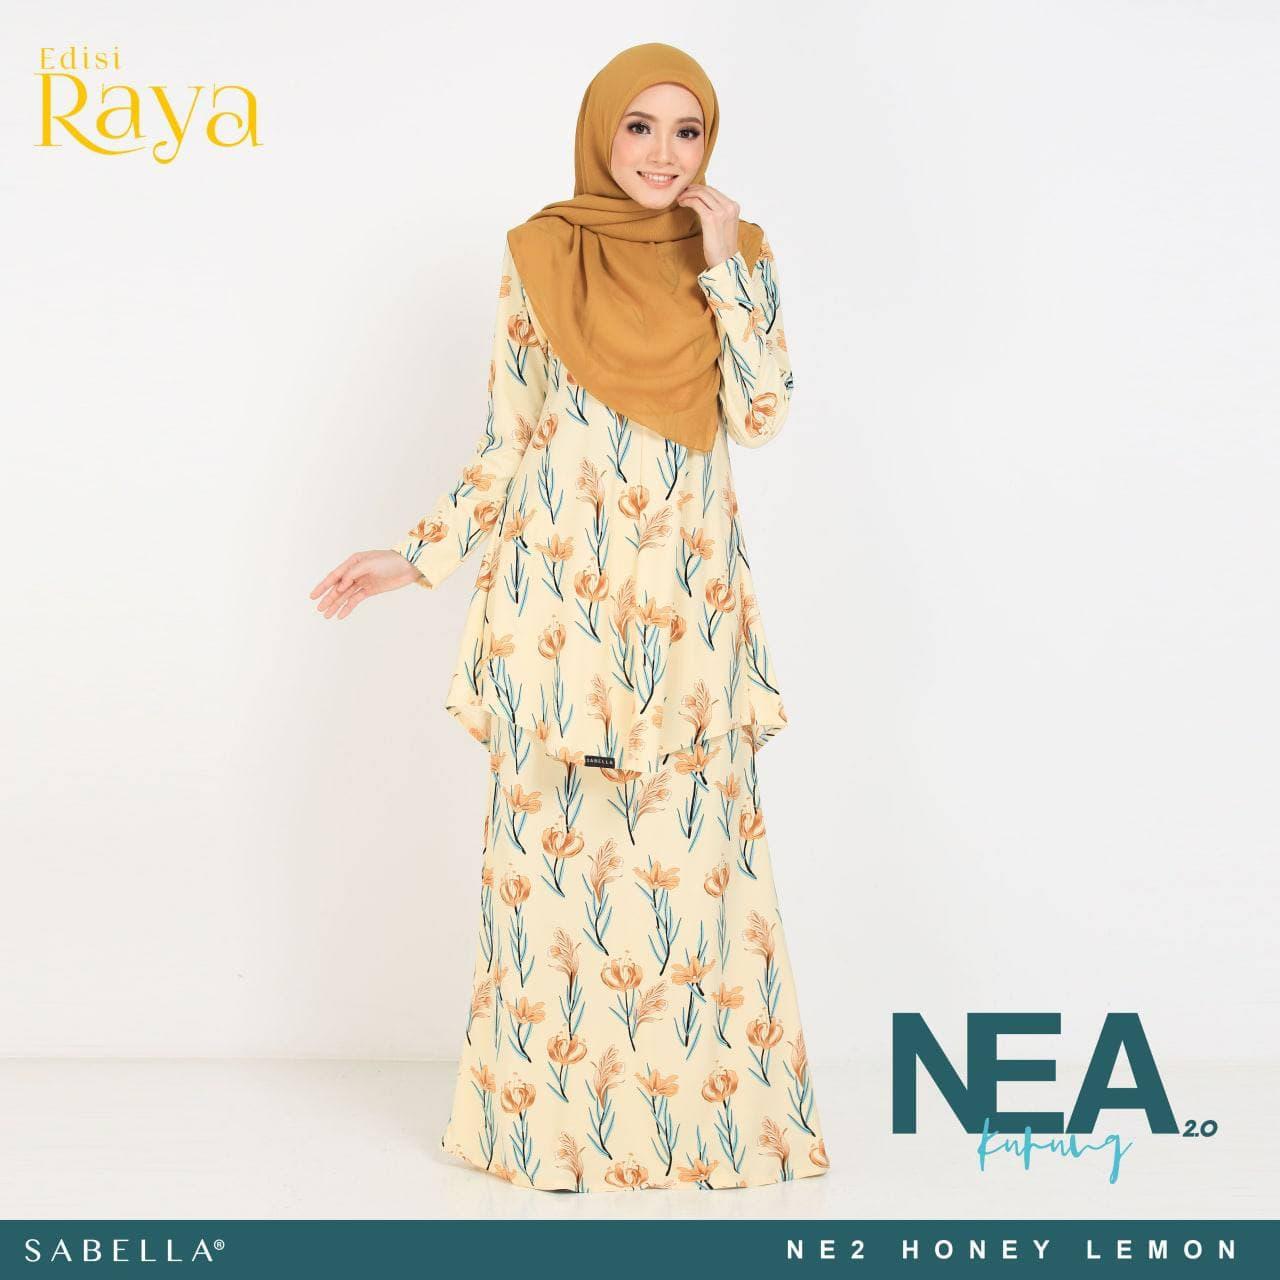 Nea Raya Honey Lemon